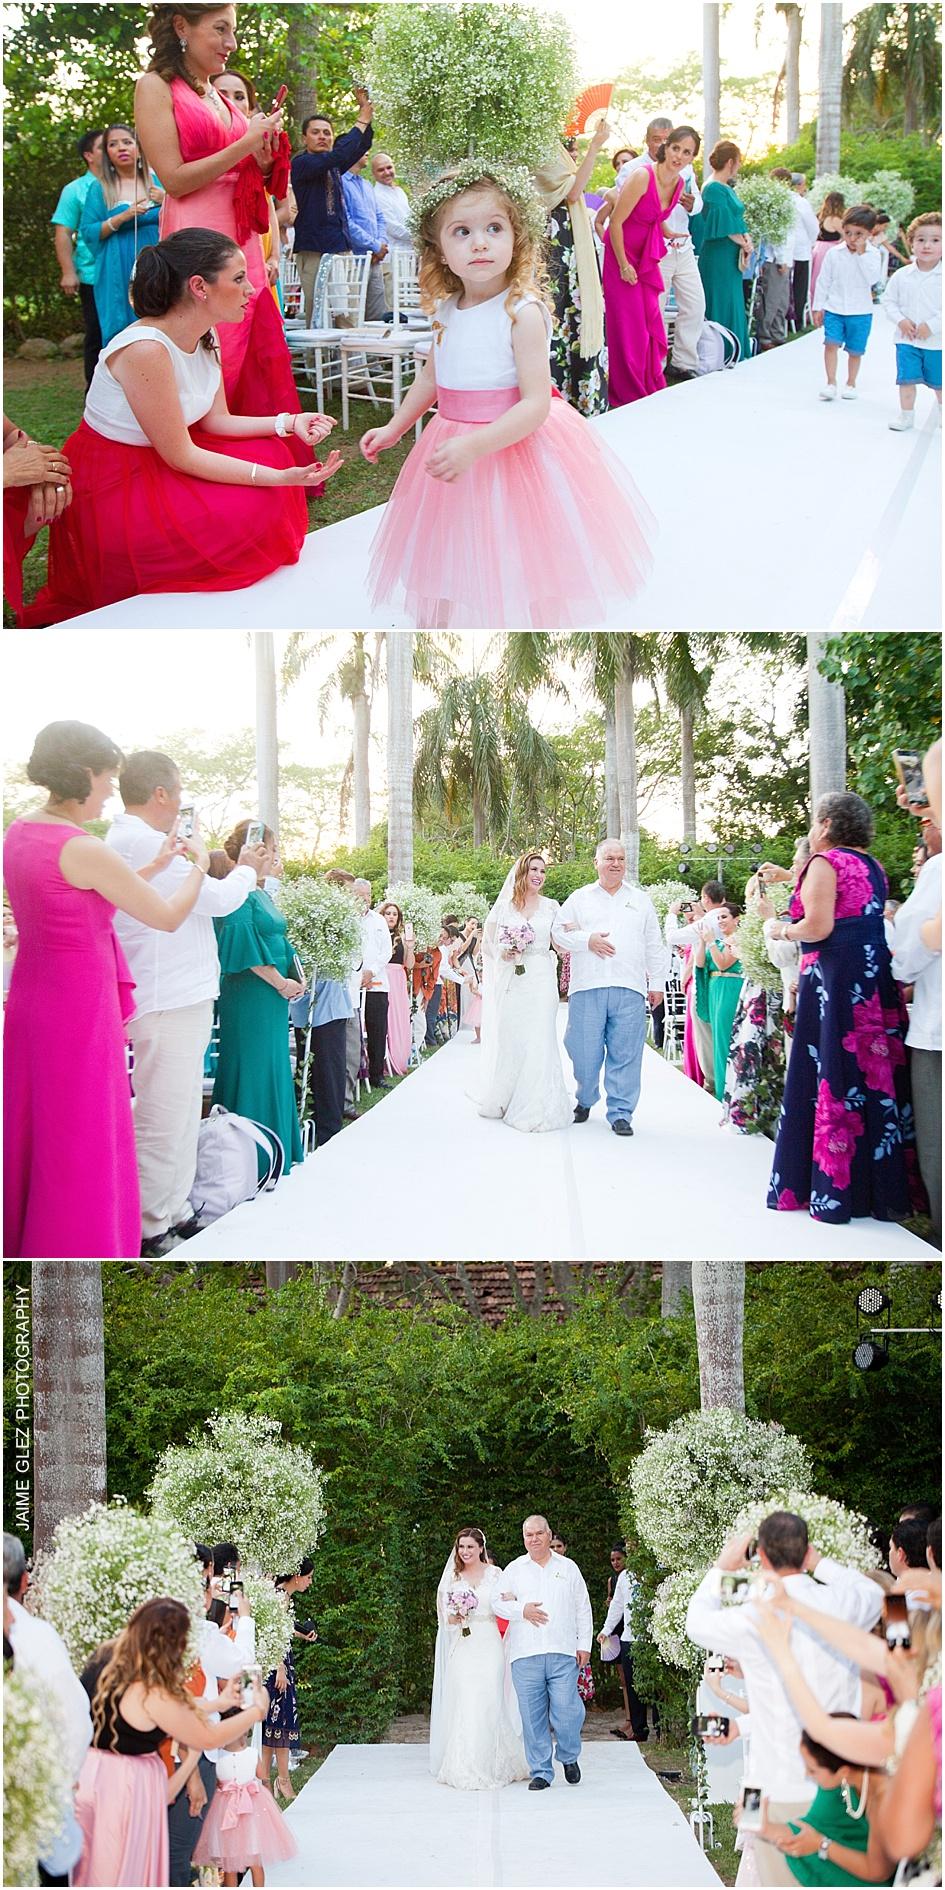 Lovely bride's entrance!